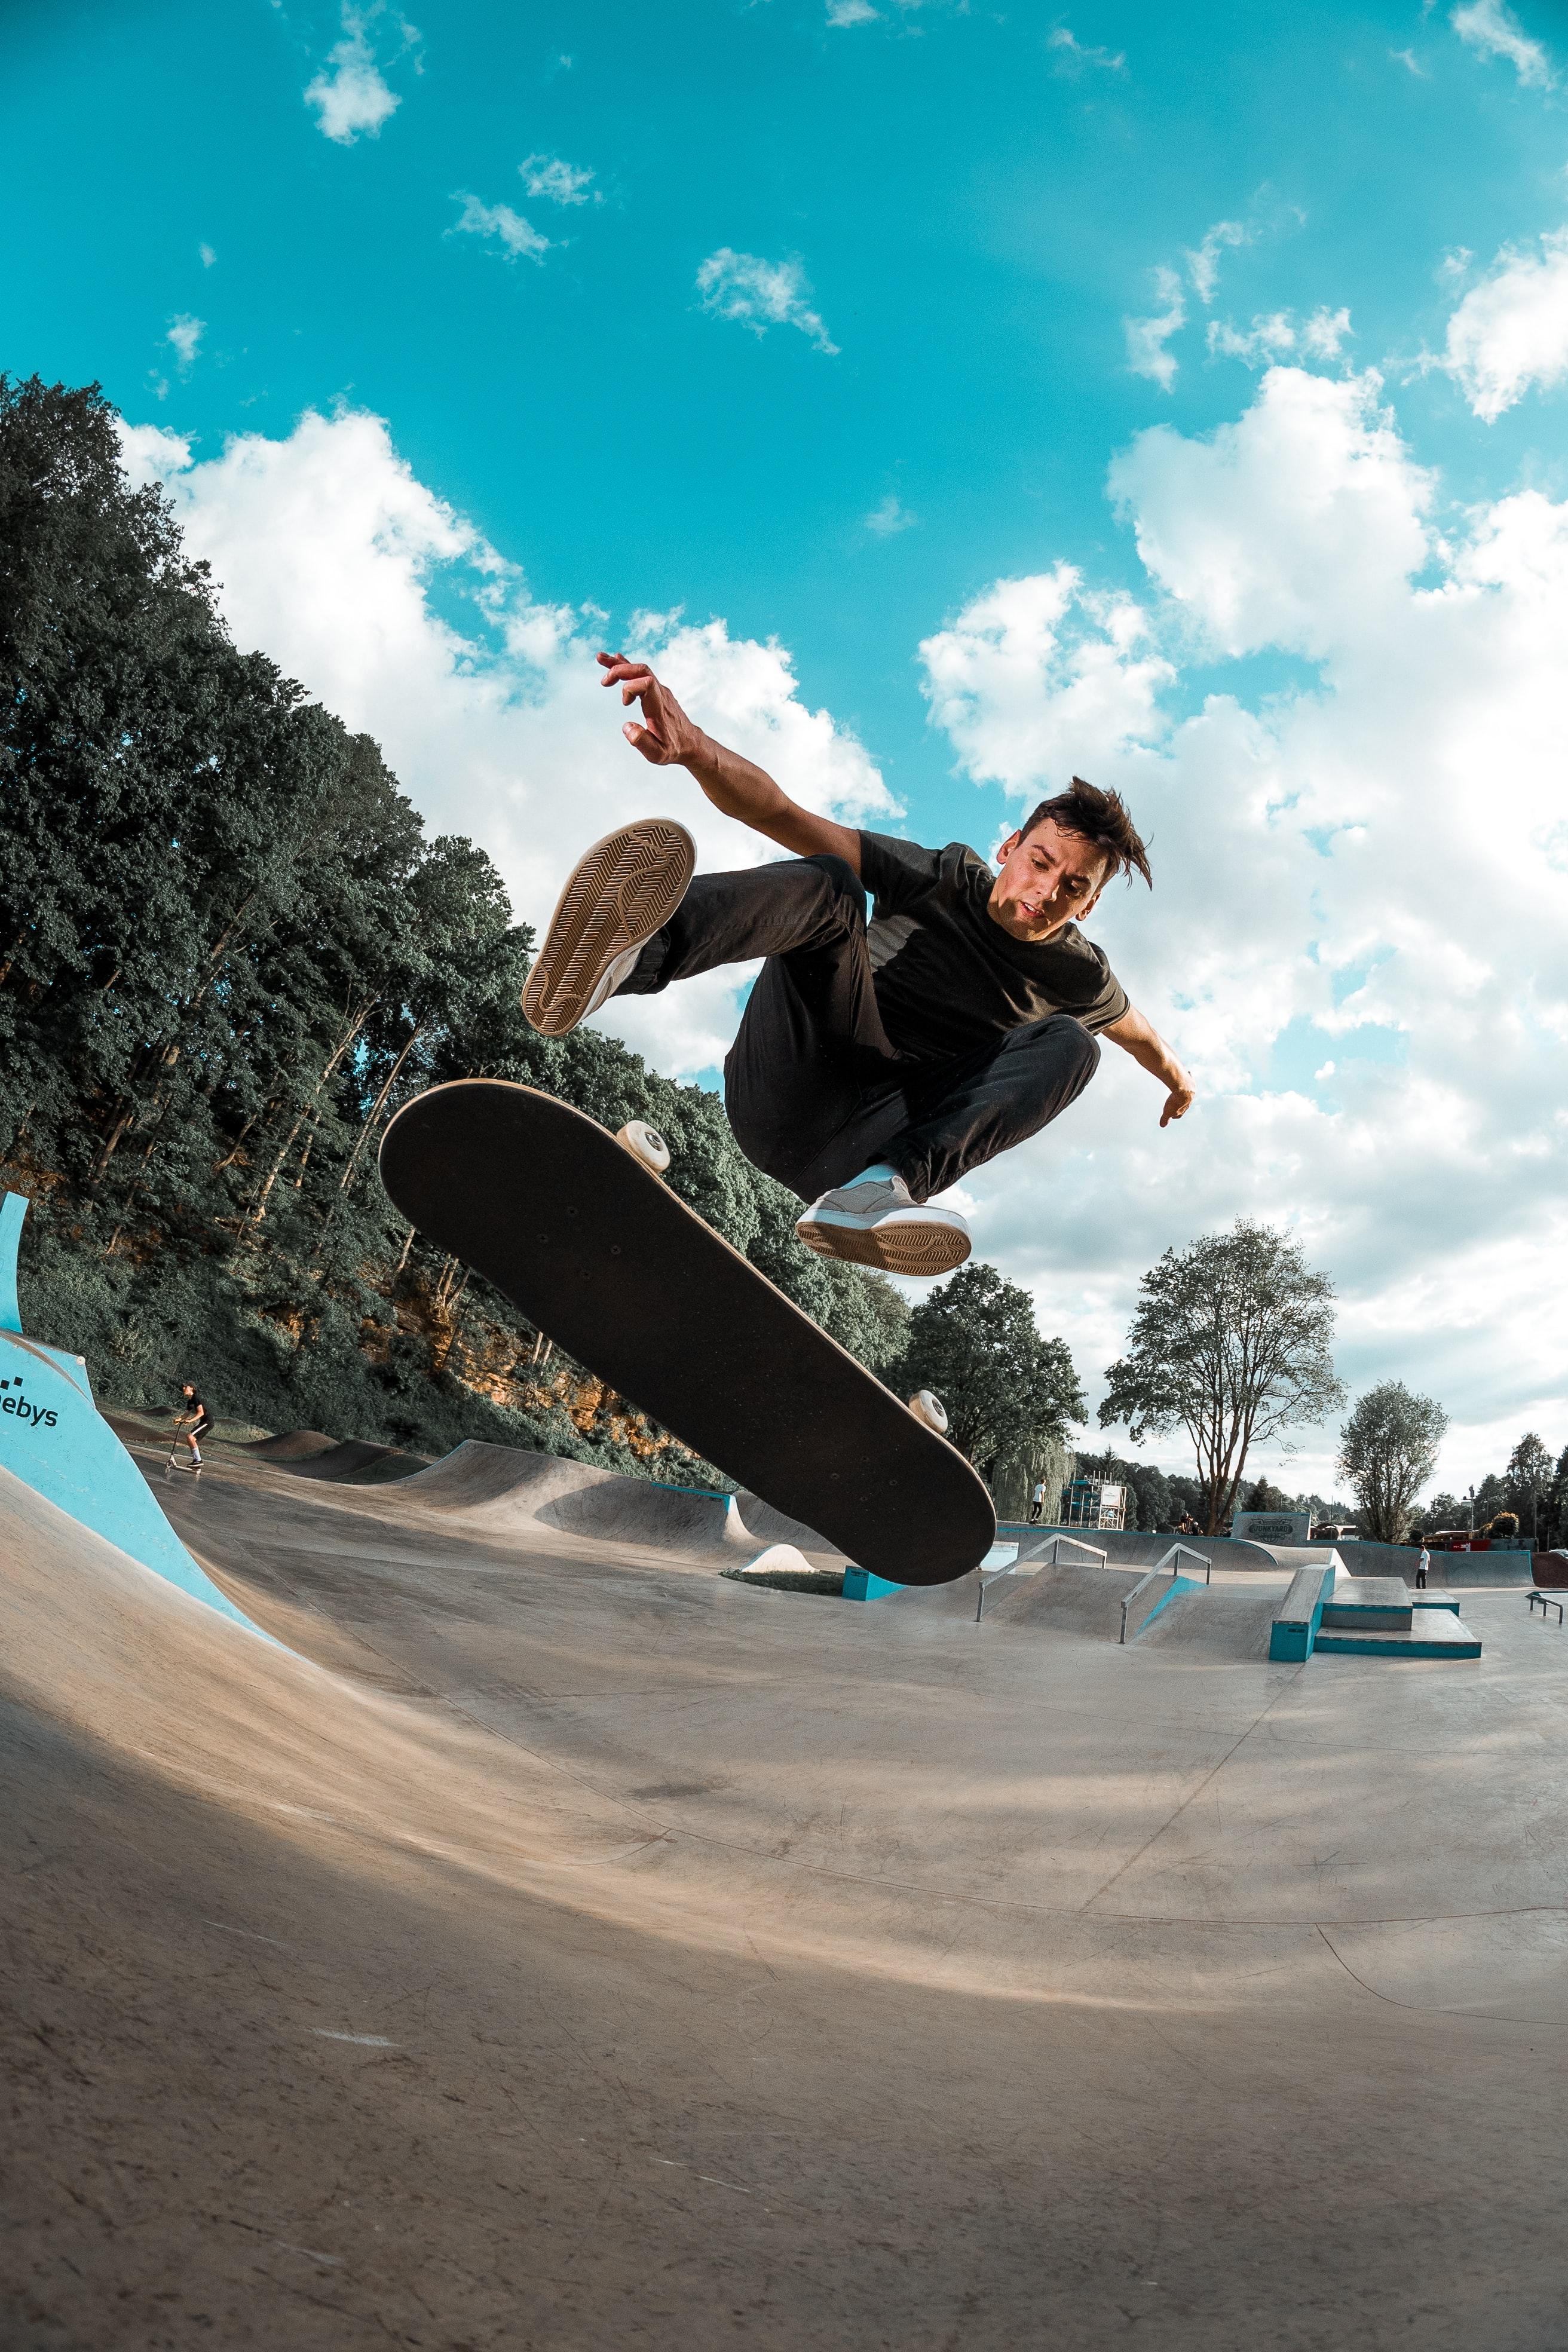 Download Game Wallpaper Skateboarding Fails Funny Images ...